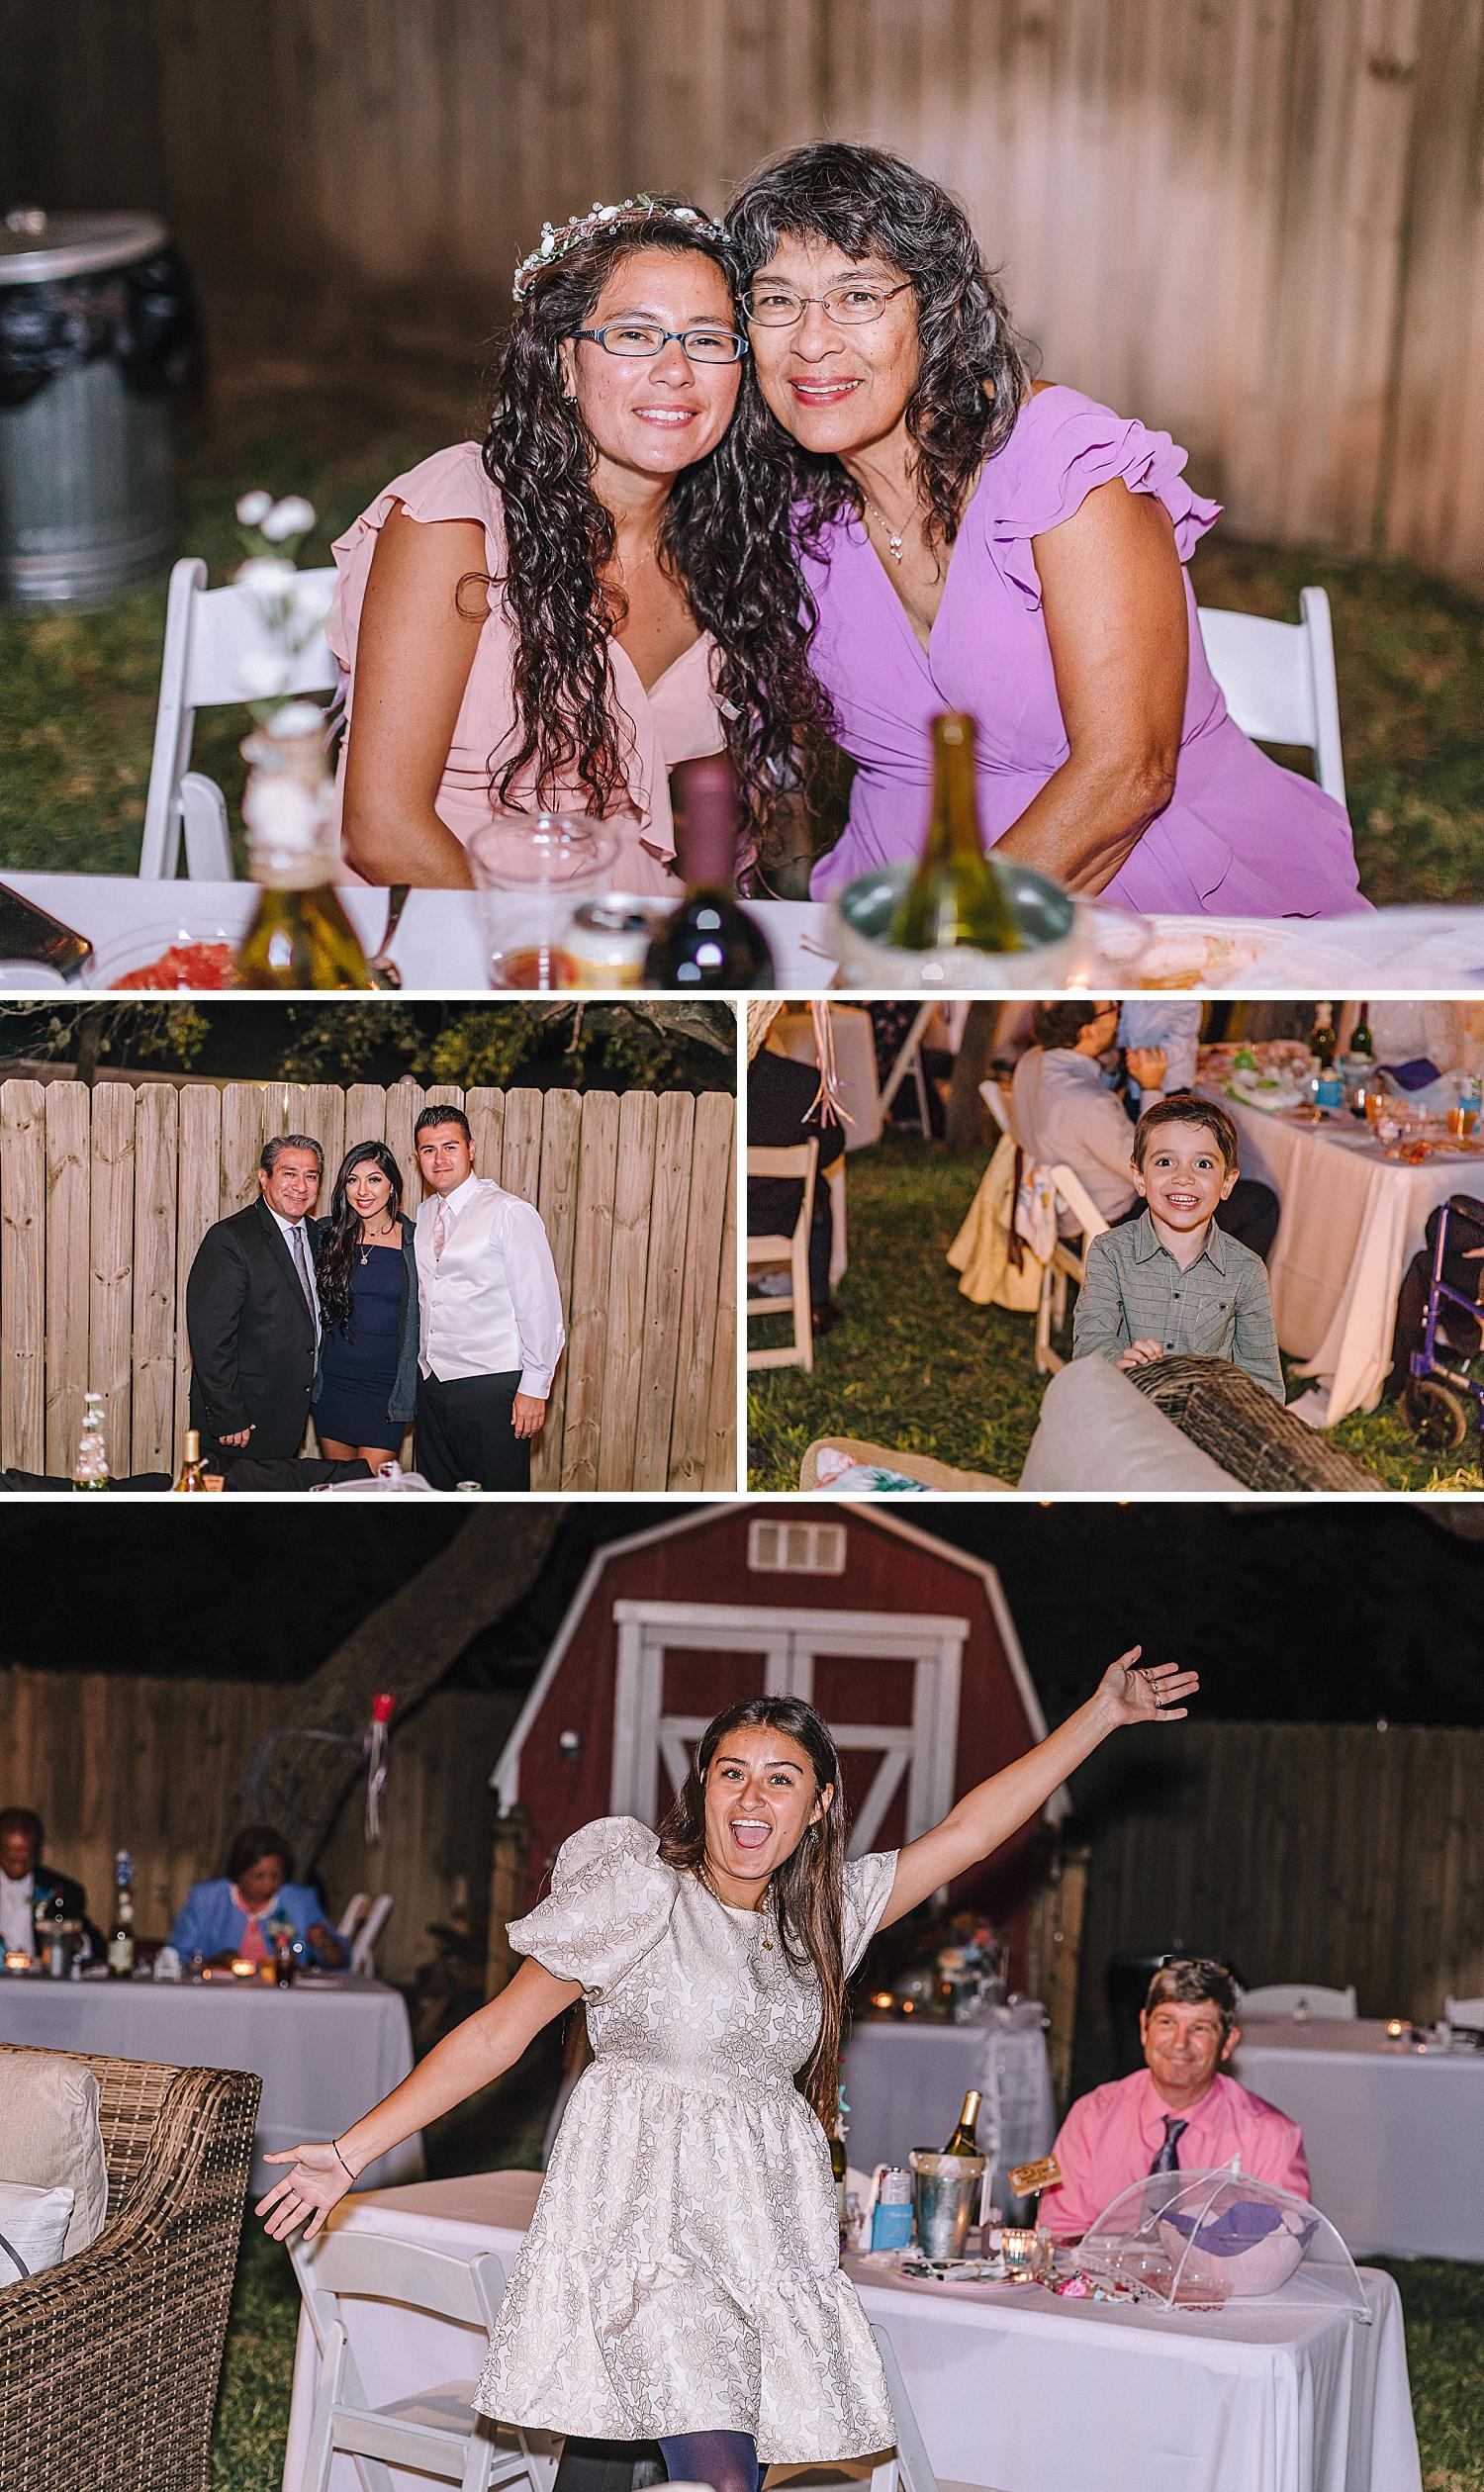 Bandera-Texas-Wedding-Photographer-Bride-Groom-on-Horses-Carly-Barton-Photography_0013.jpg